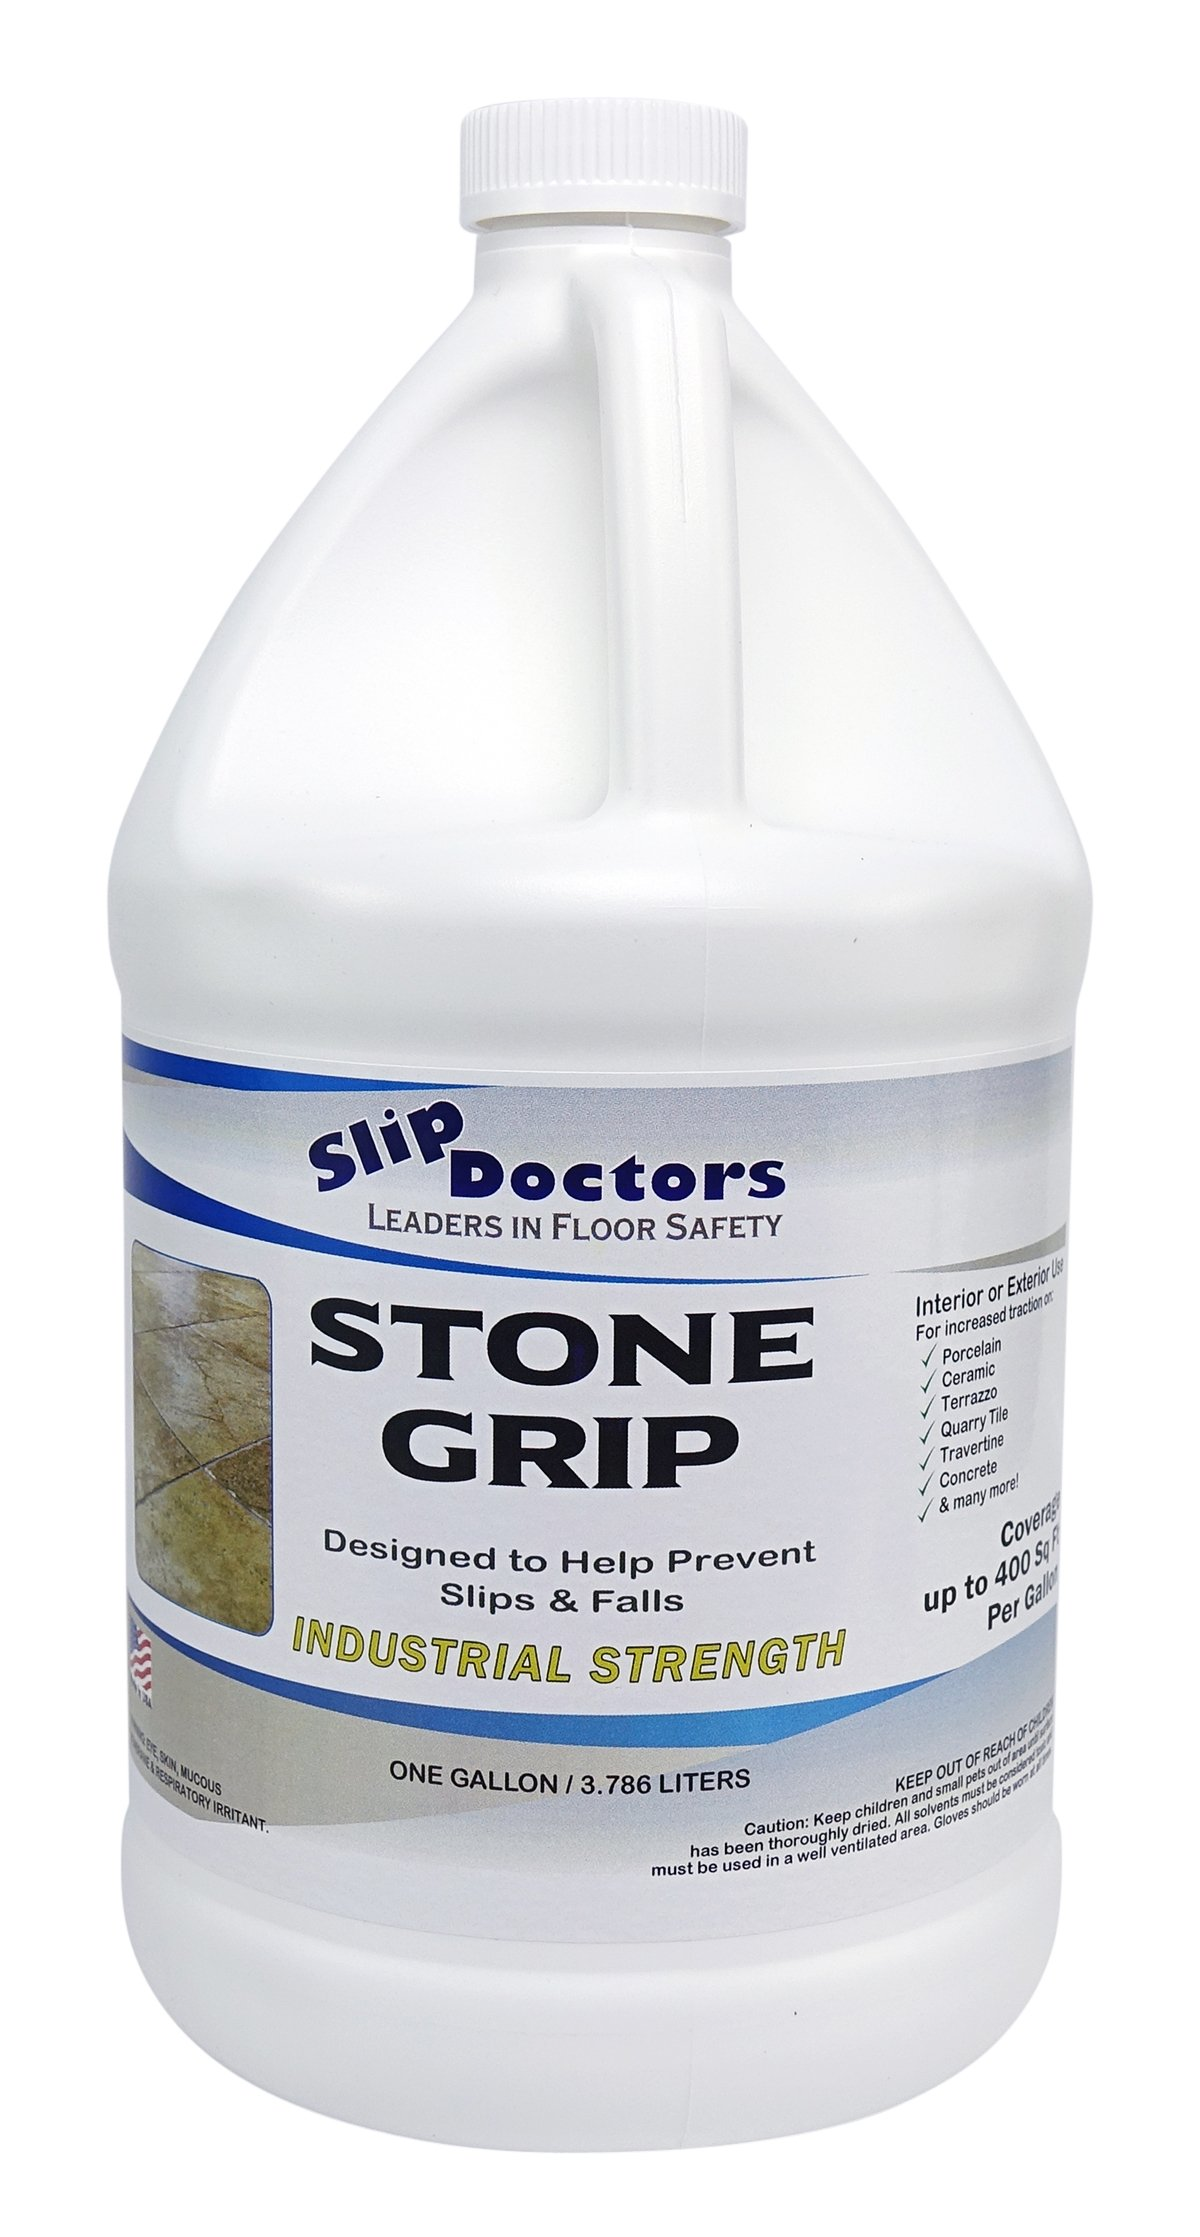 SlipDoctors Stone Grip Anti-Slip Floor Treatment, 1 Gallon Bottle, Yellow by Slip Doctors